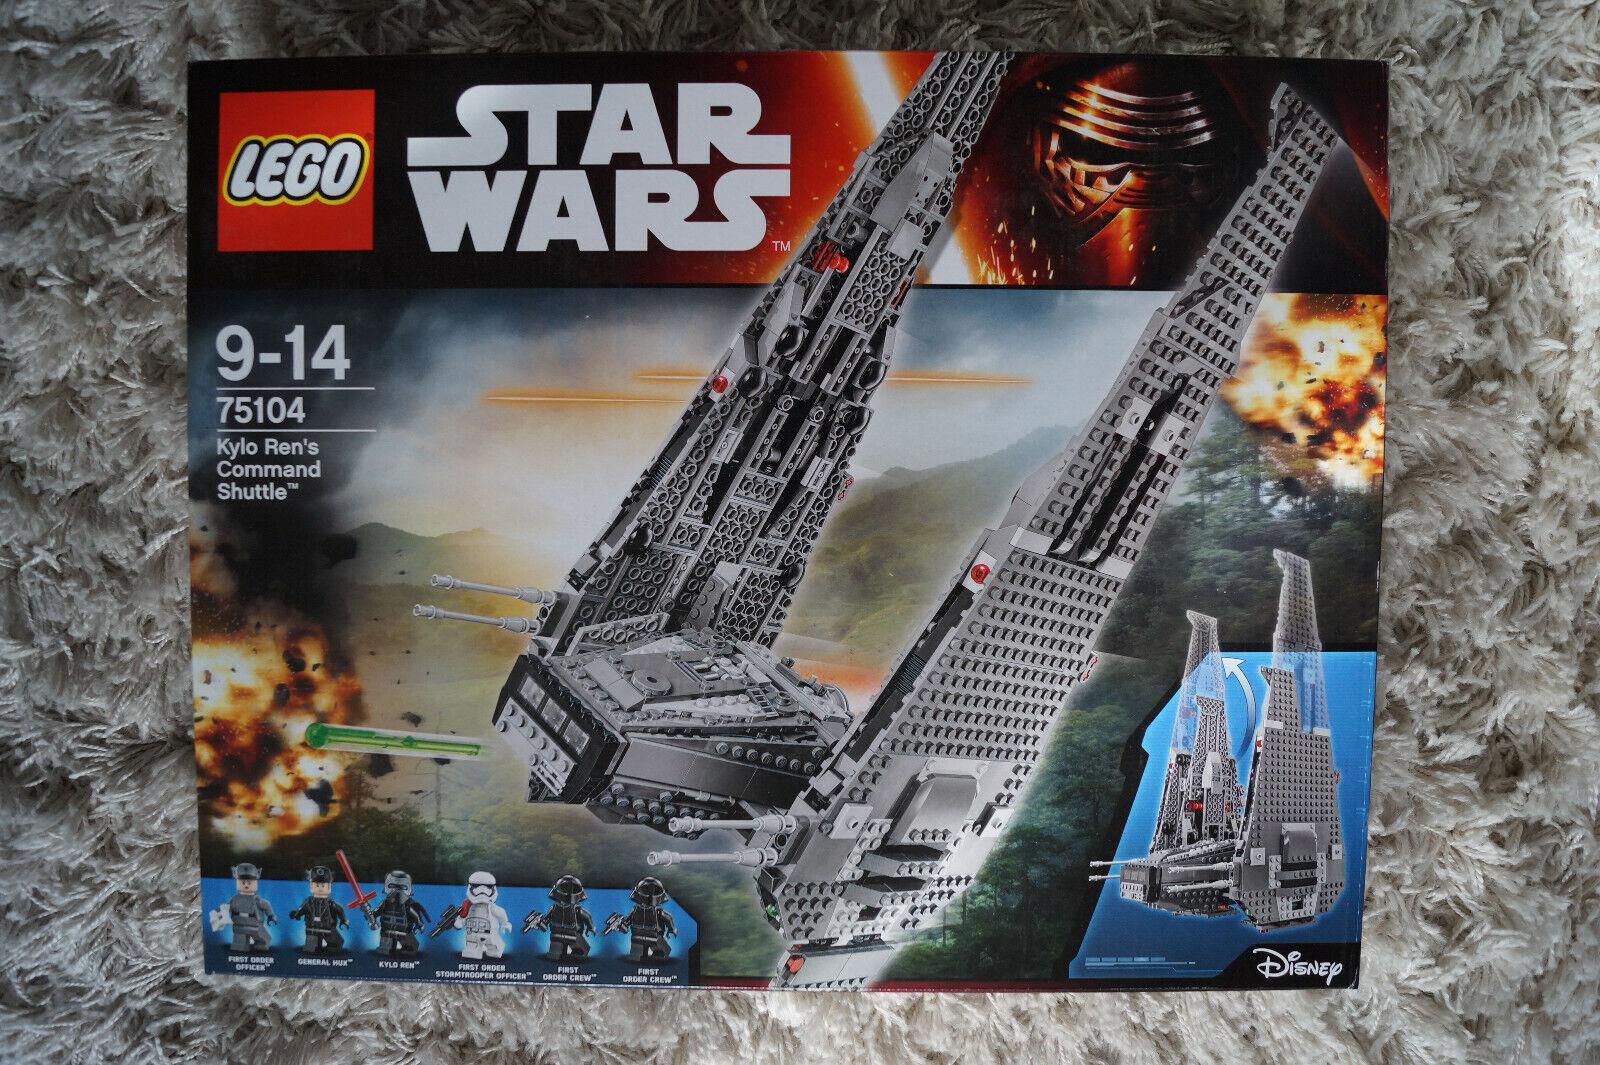 LEGO Stern WARS Set 75104 Kylo Ren's Command Shuttle NEU & OVP